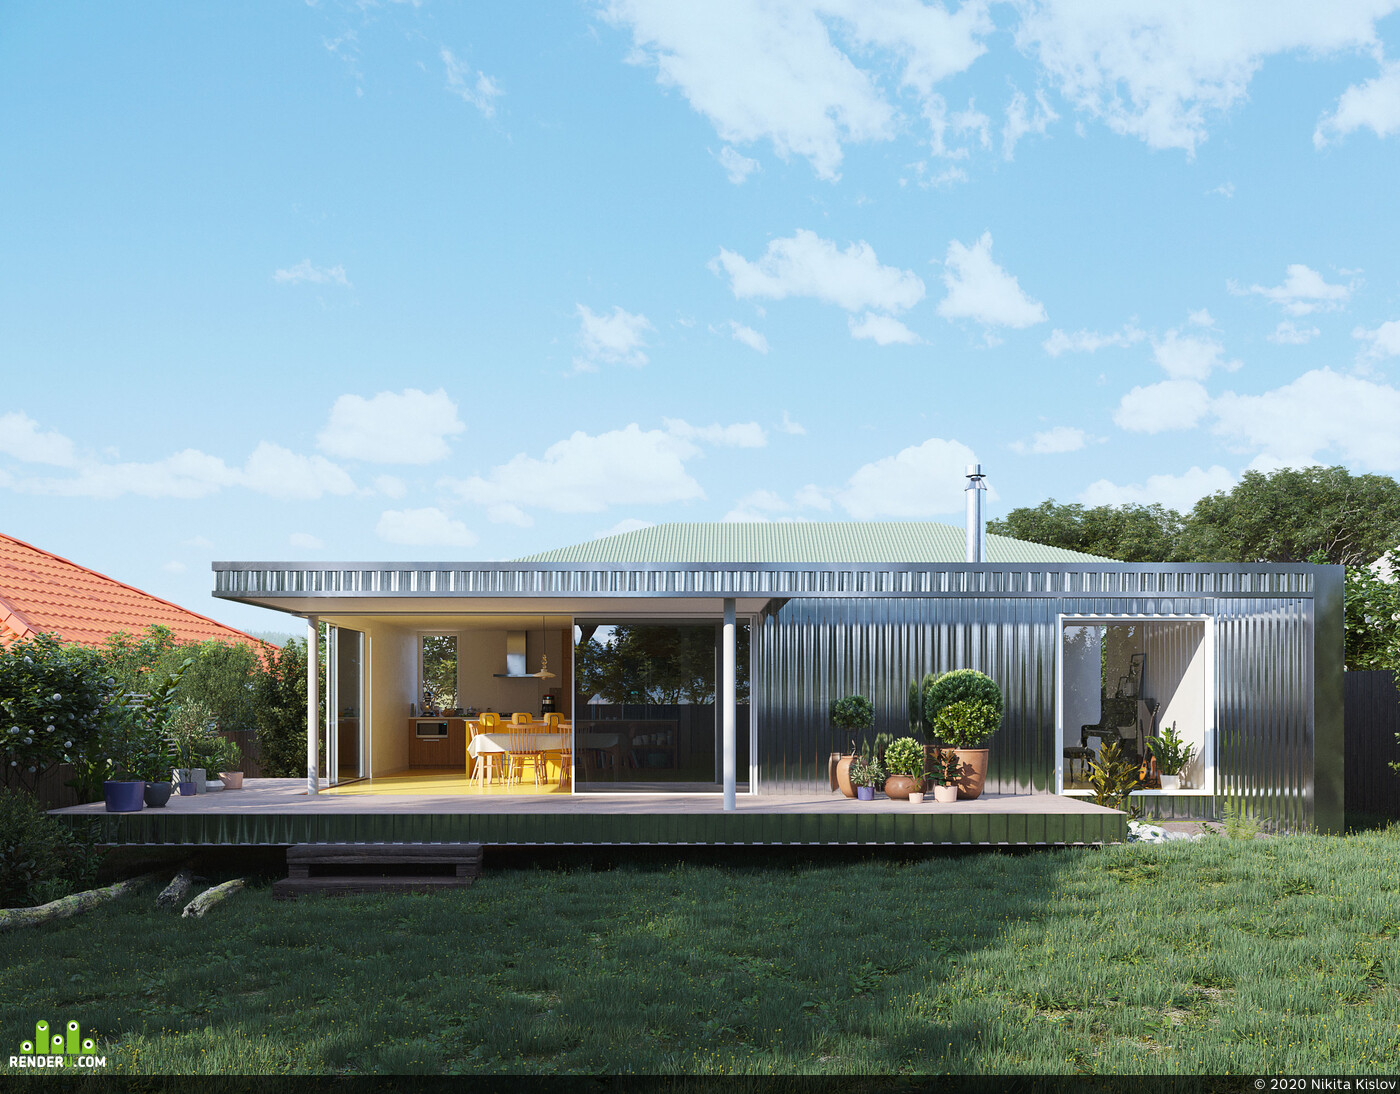 metal, greenhouse, house, Exterior, exteriorrendering, exterior visualization, Exterior architecture, 3D Architectural Visualization Architecture Public building interiordesign exterior visualisation